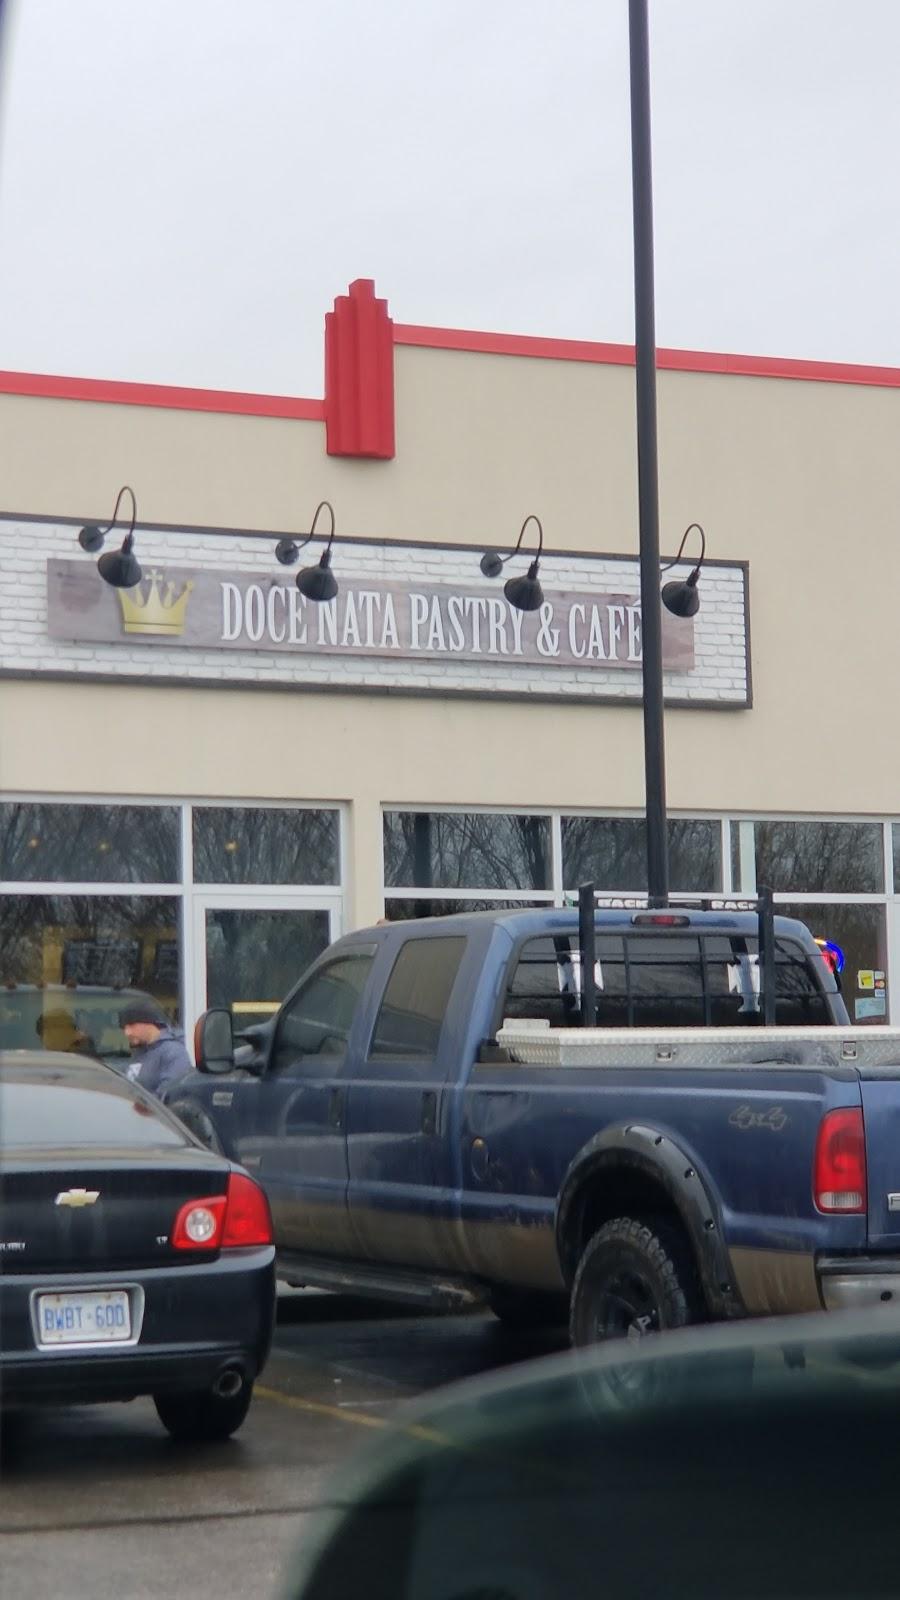 Doce Nata Pastry & Cafe | bakery | 259 Hamilton Regional Rd 8, Stoney Creek, ON L8G 1E4, Canada | 9055703574 OR +1 905-570-3574